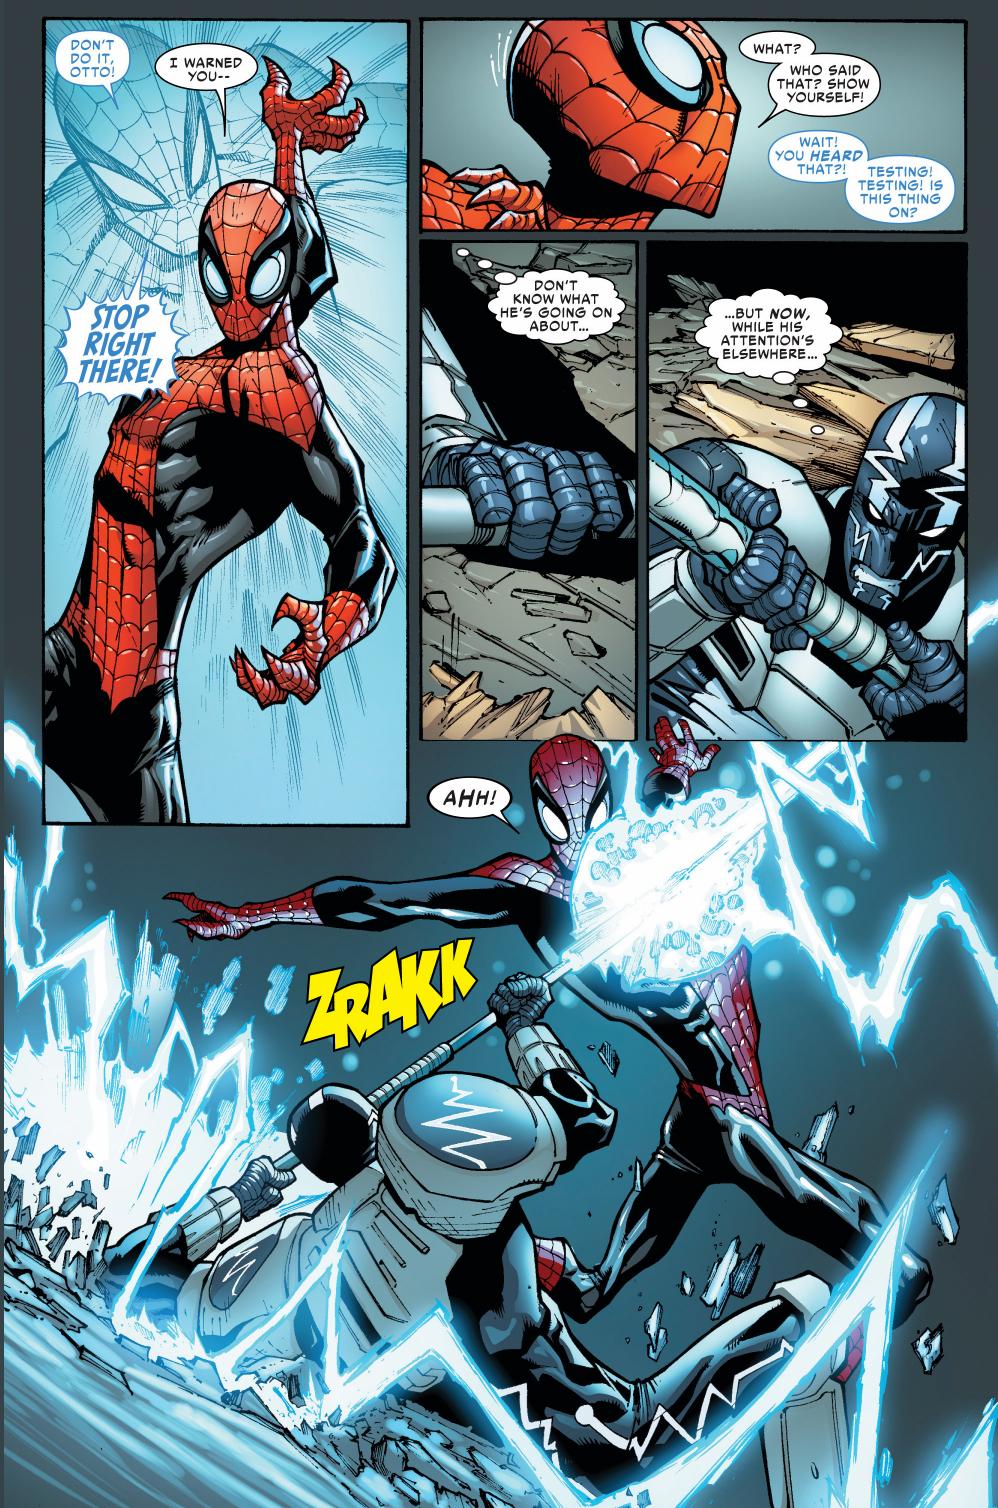 superior spider-man vs cardiac